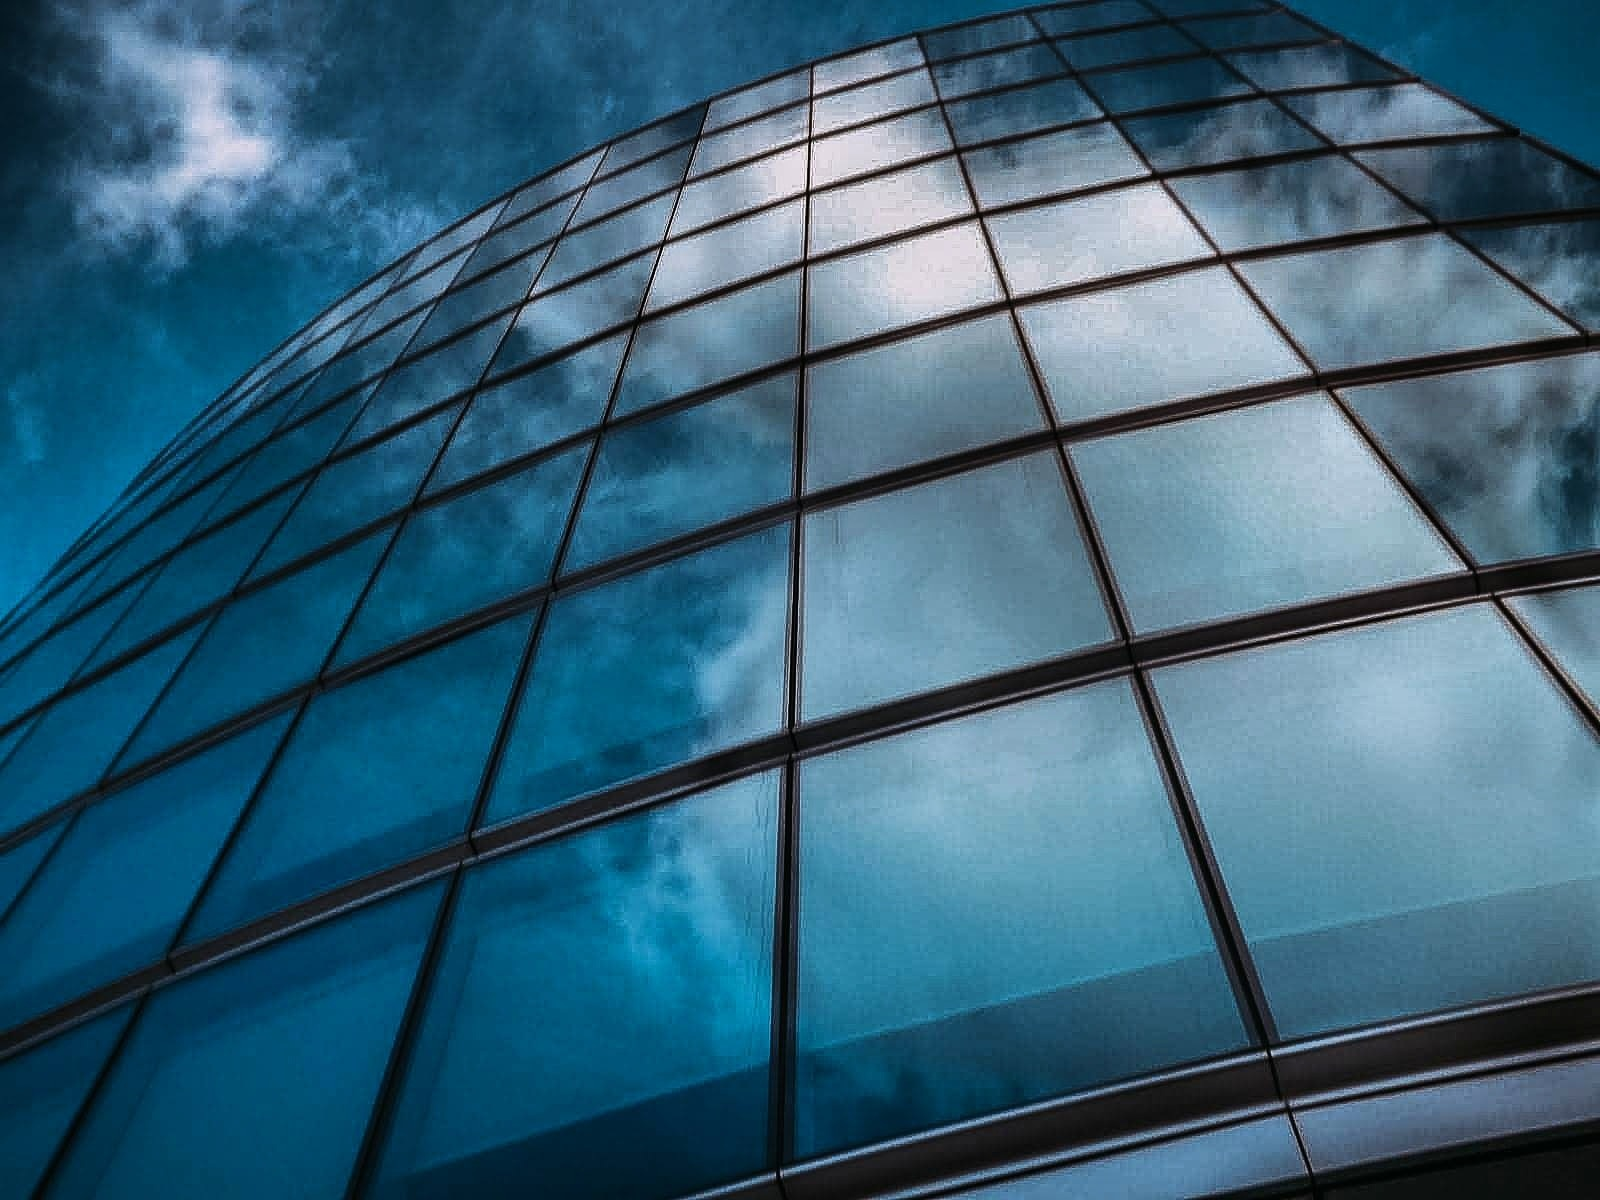 skyscraper reflection  by Pawel M